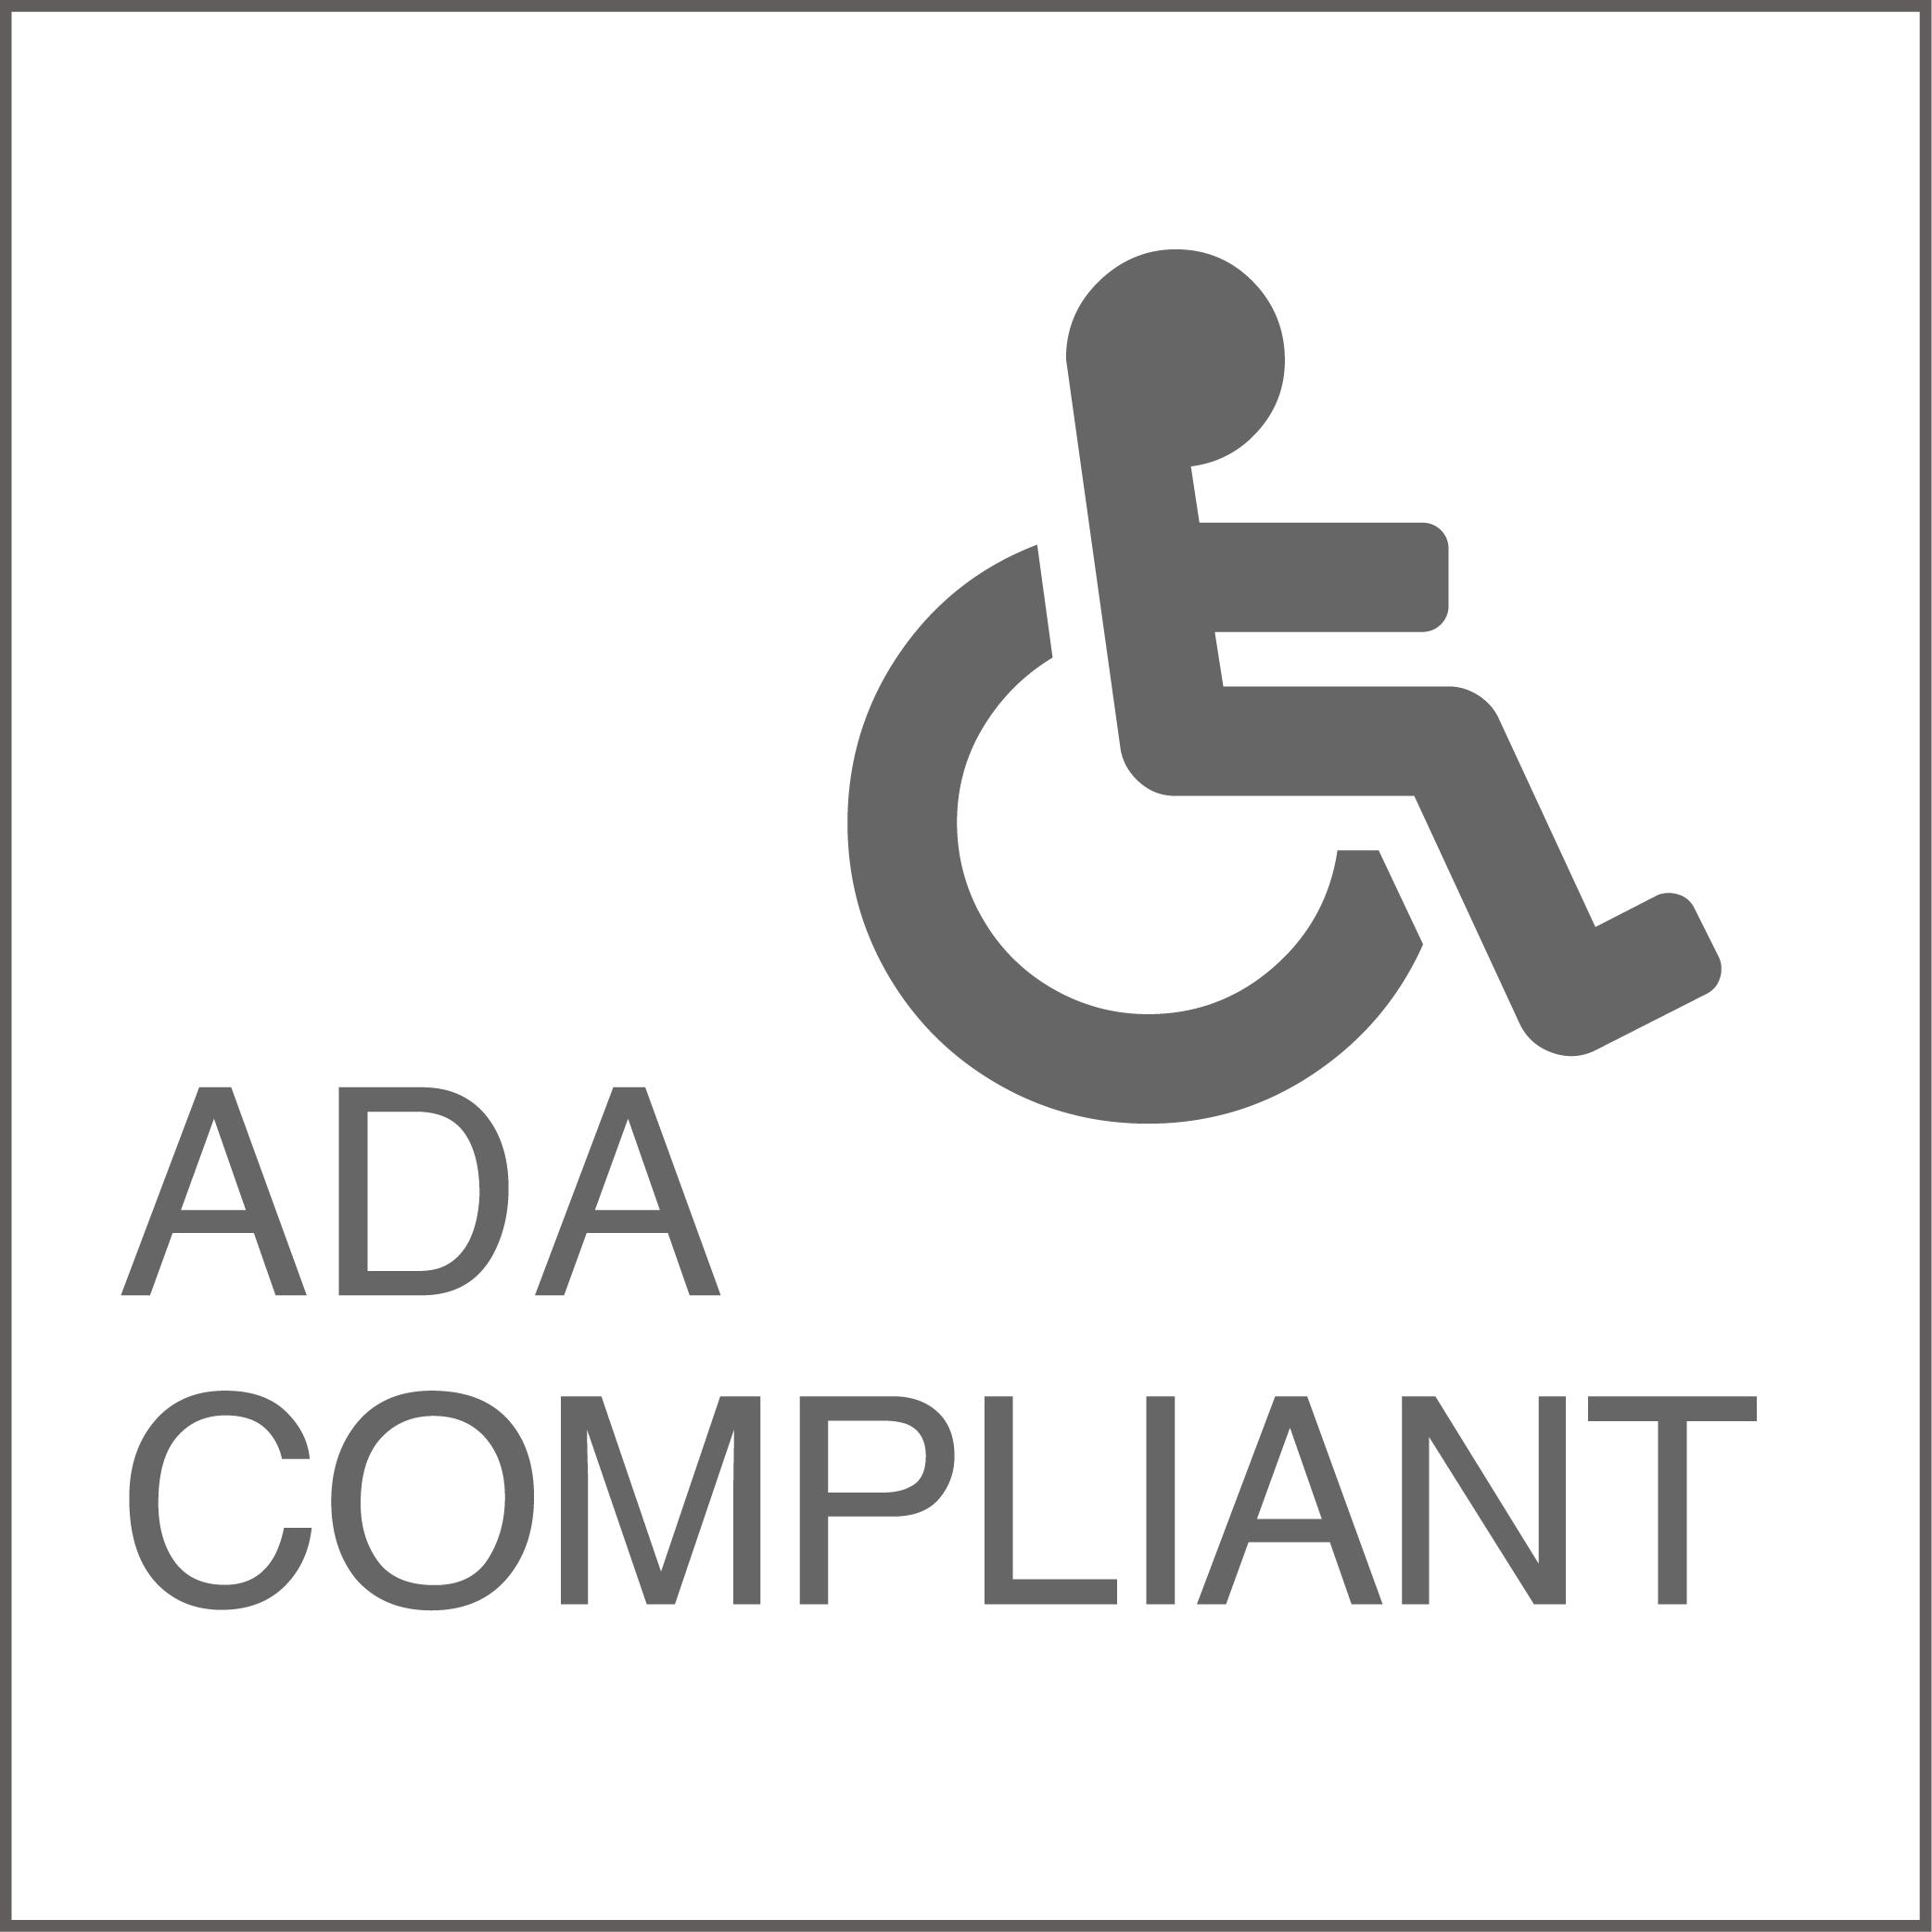 ada-compliant